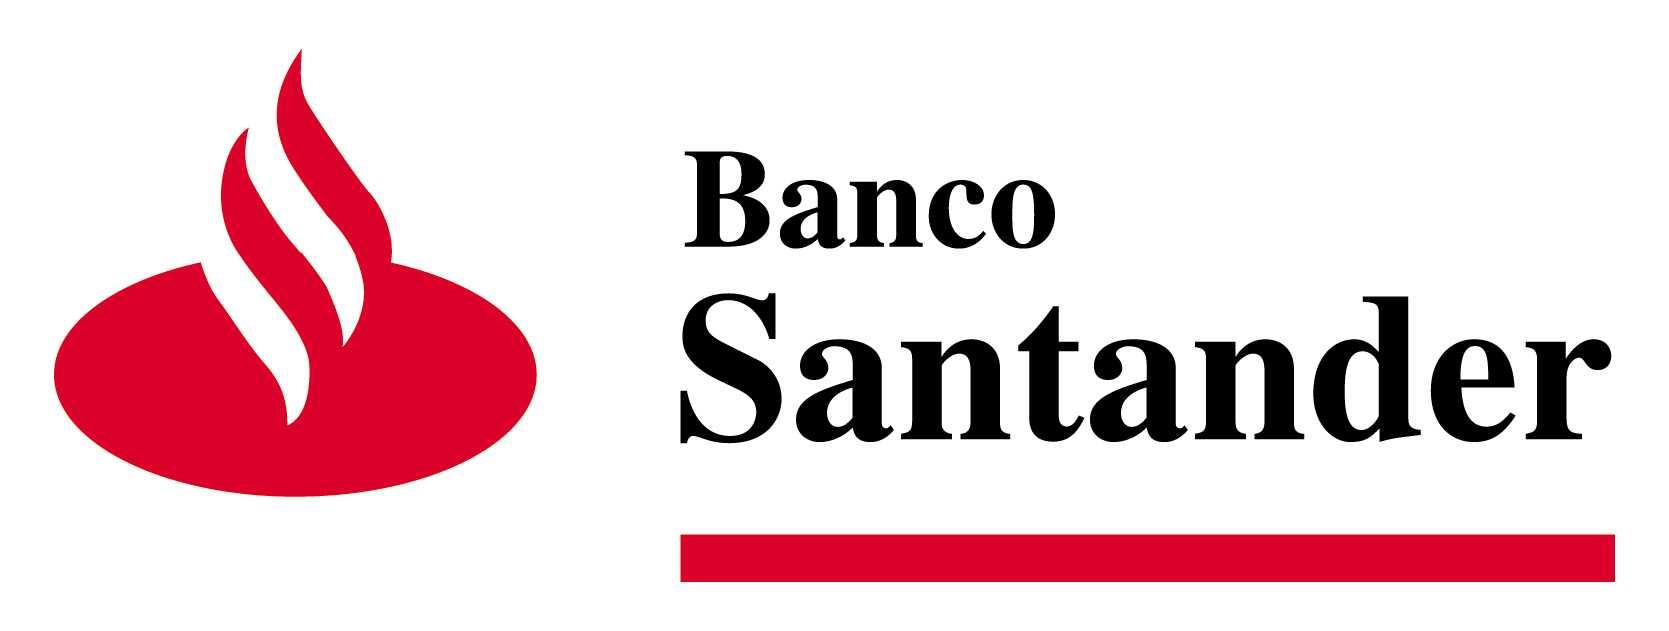 Banco Santander Uruguay Chooses Cryptomathic and ICPayment to ...